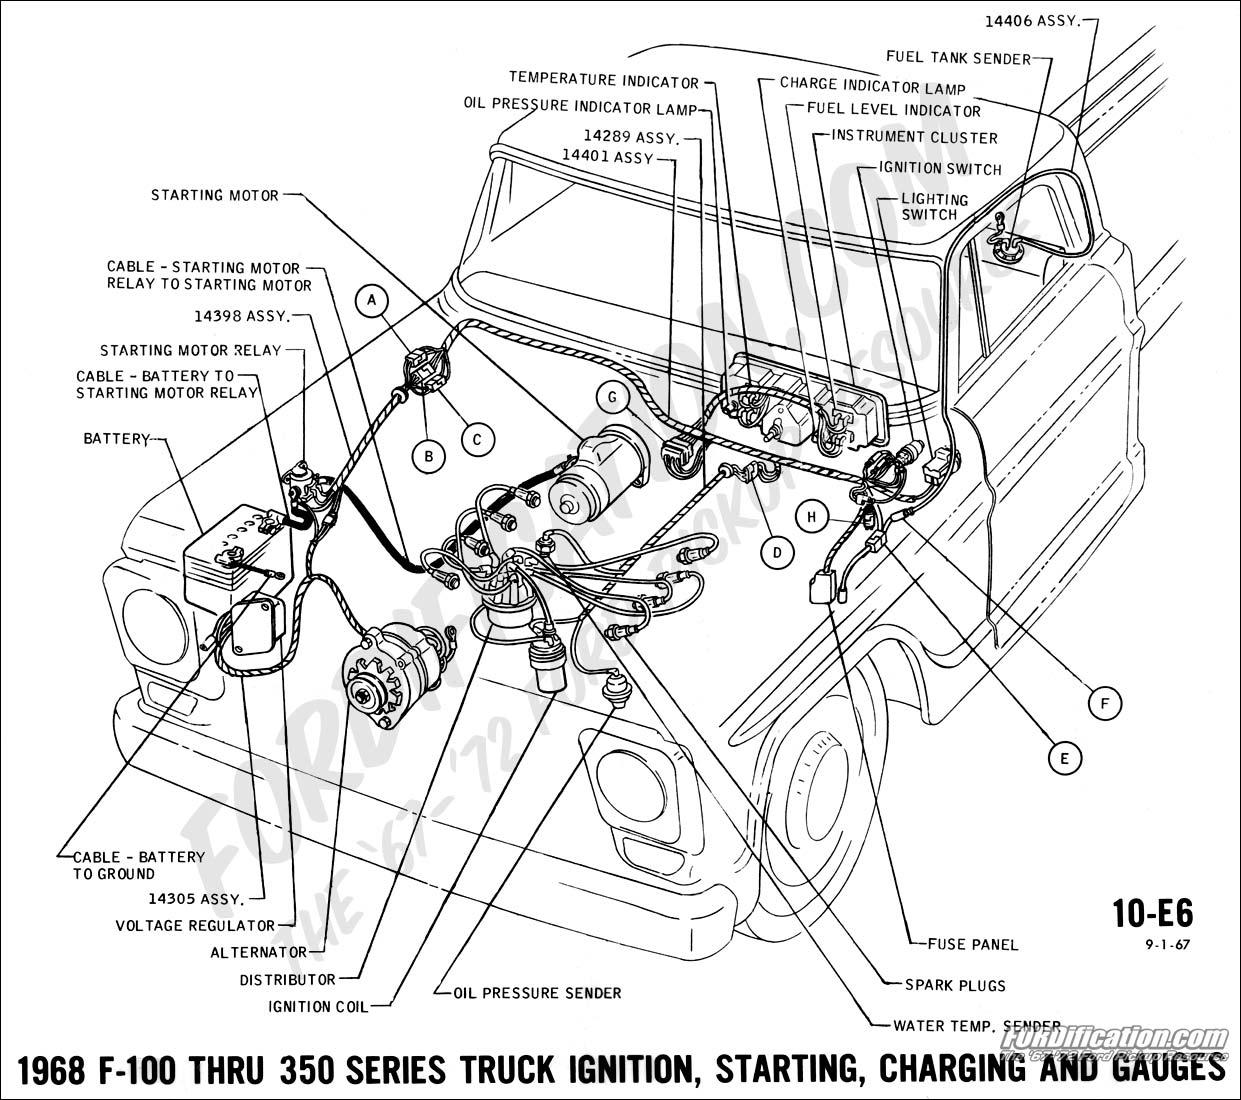 1969 ford power steering pump diagram imageresizertool com  1969 Camaro Ignition Wiring Diagram